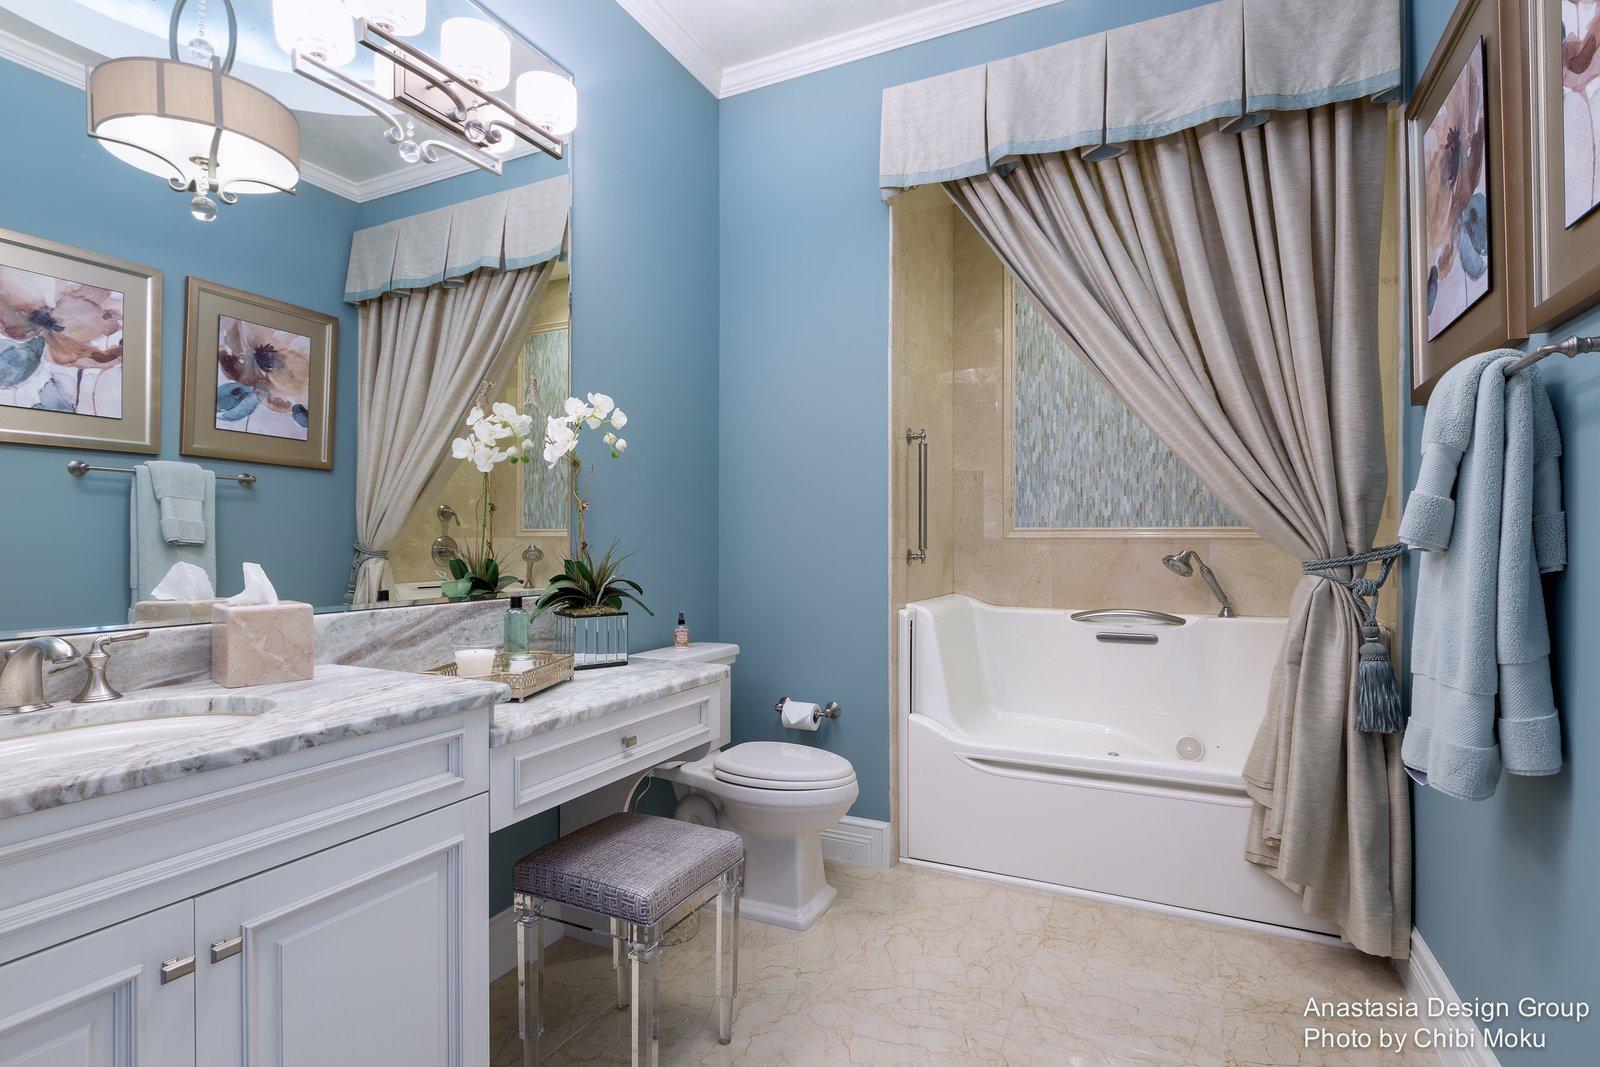 Architecture Spotlight #82 | Palm Coast Paradise by Anastasia Design Group | Palm Coast, FL by Chibi Moku